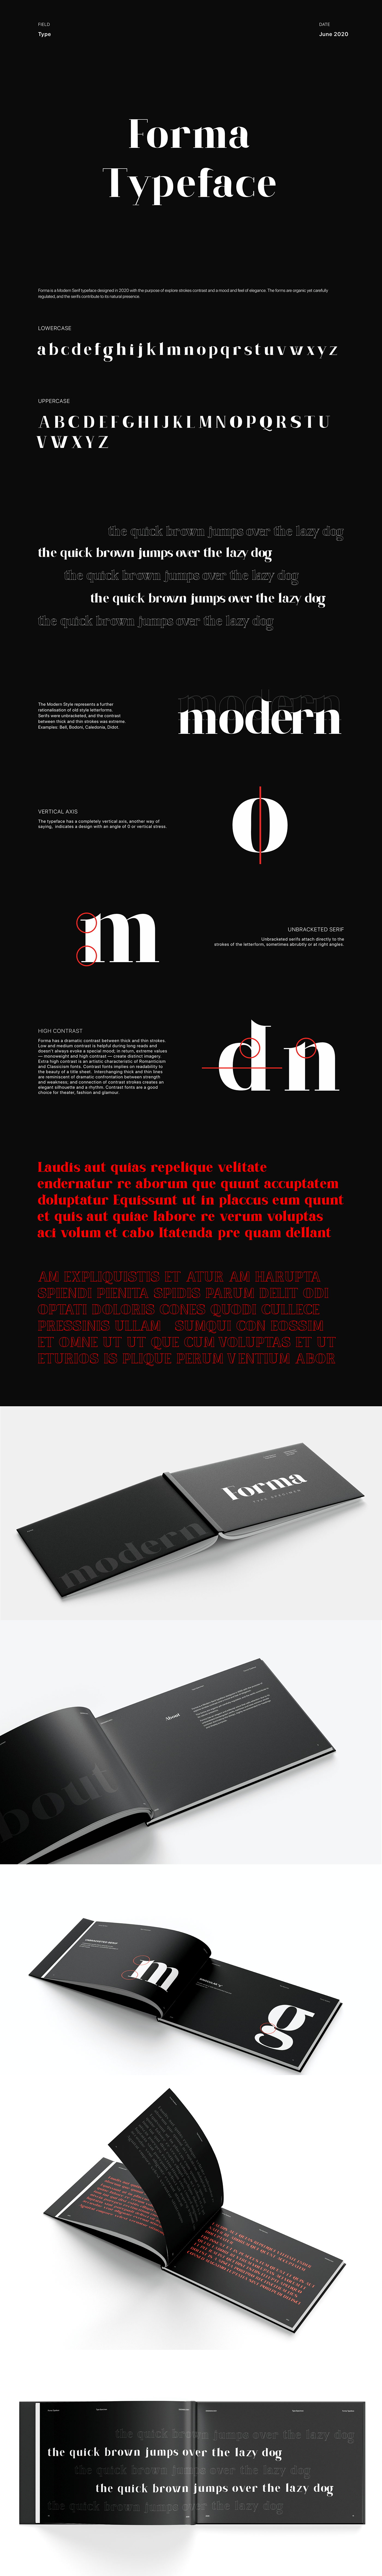 font modern serif tipografia type Typeface typography